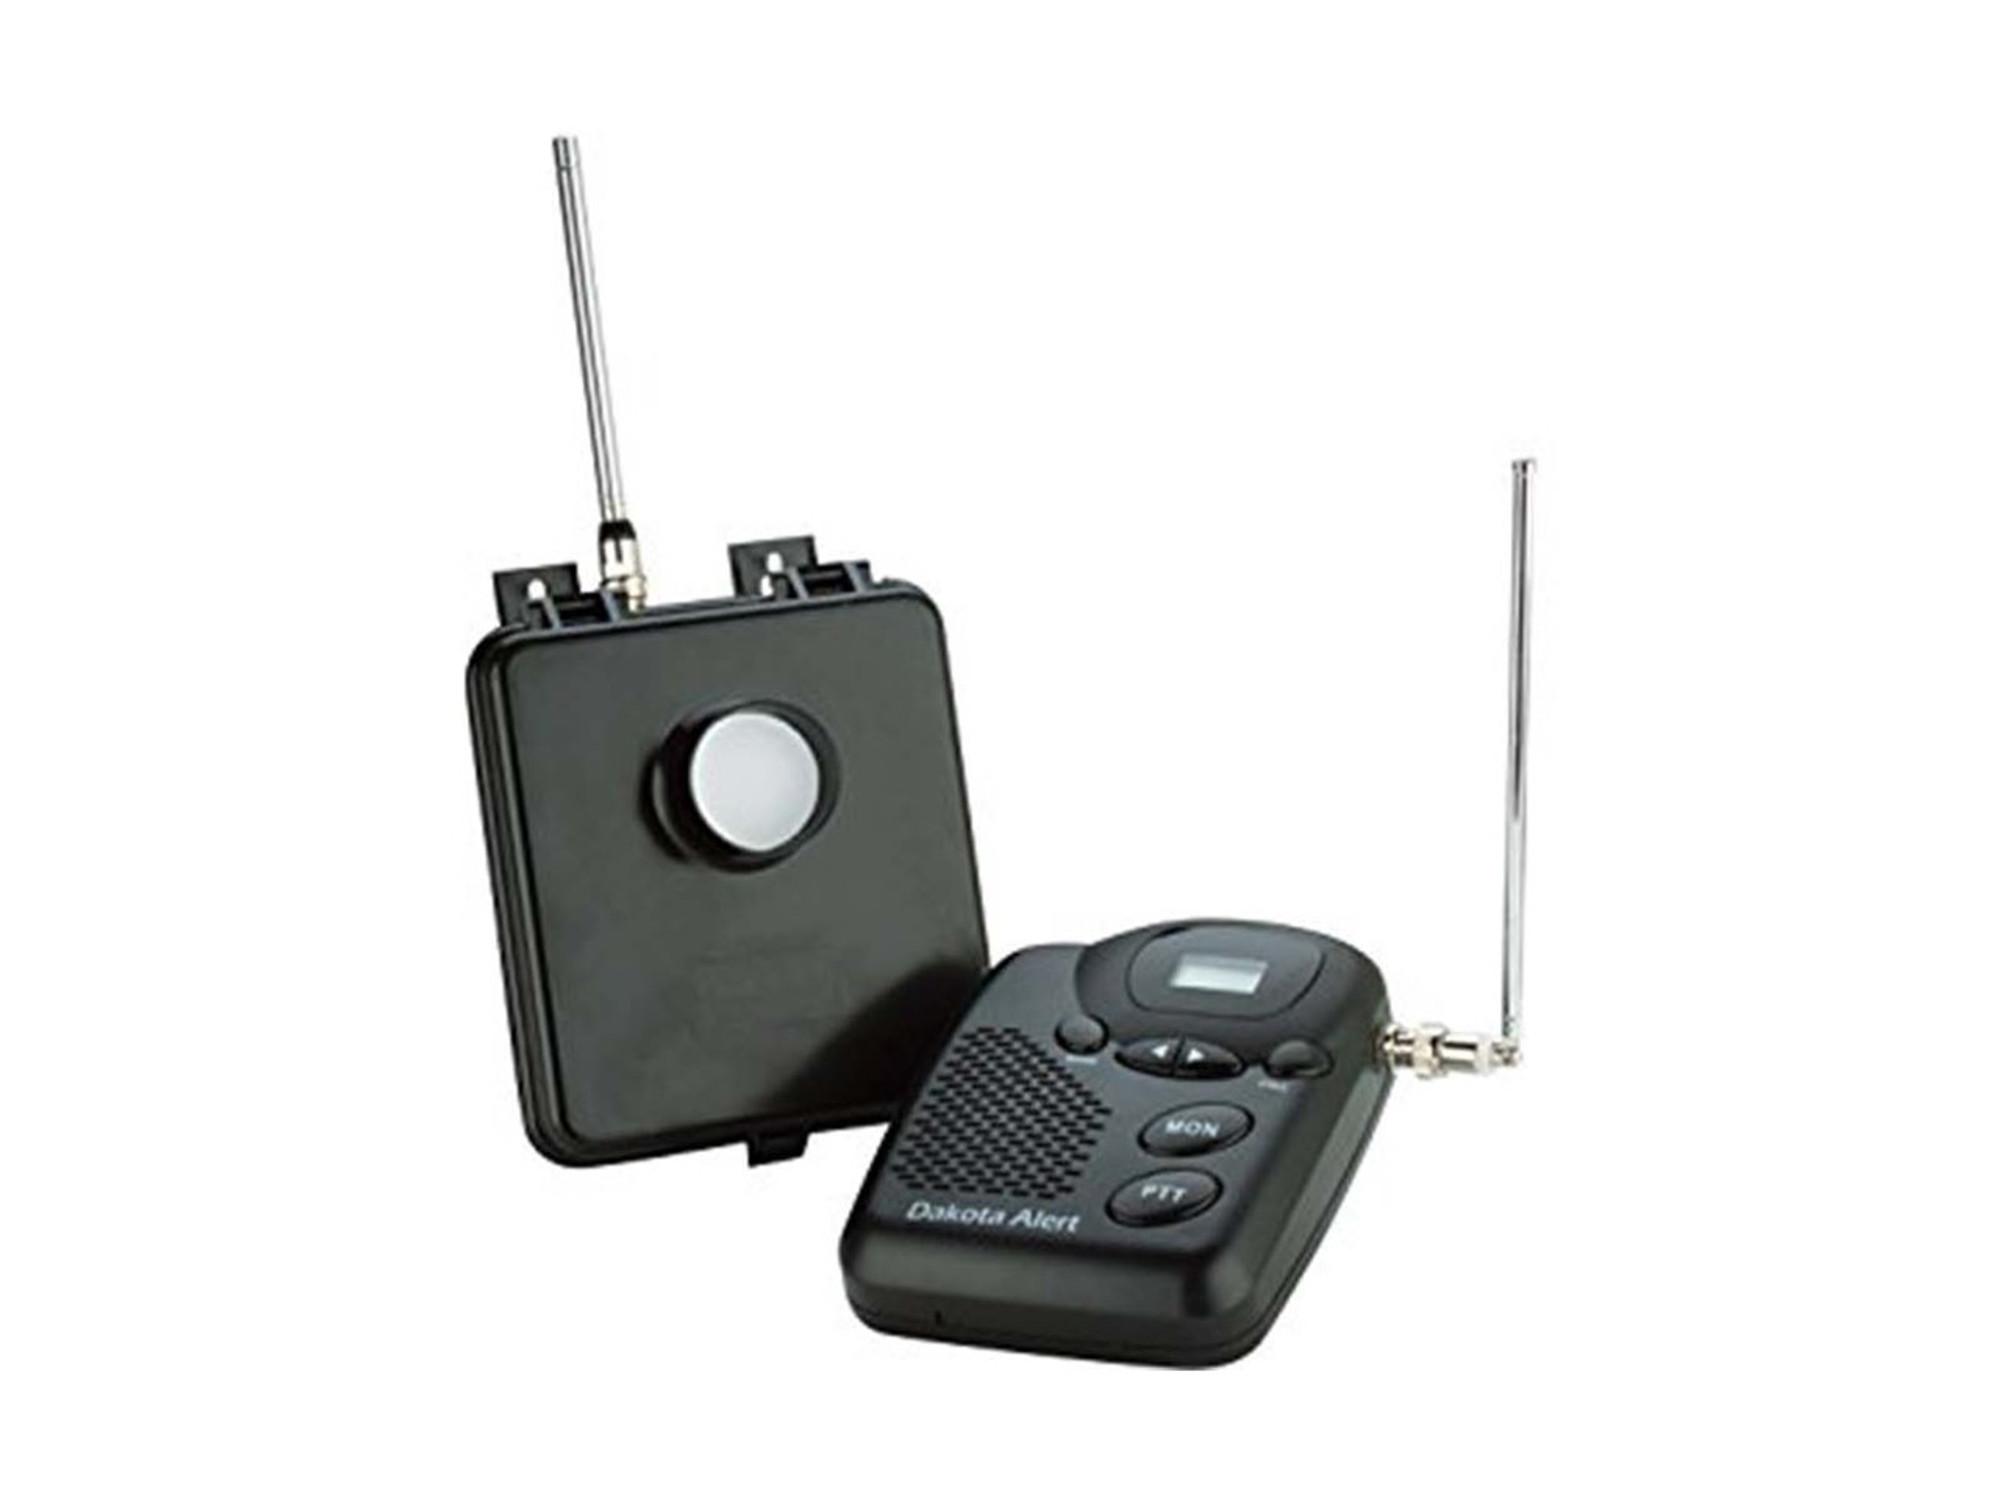 Dakota Alert Murs Transmitter Brickhouse Security